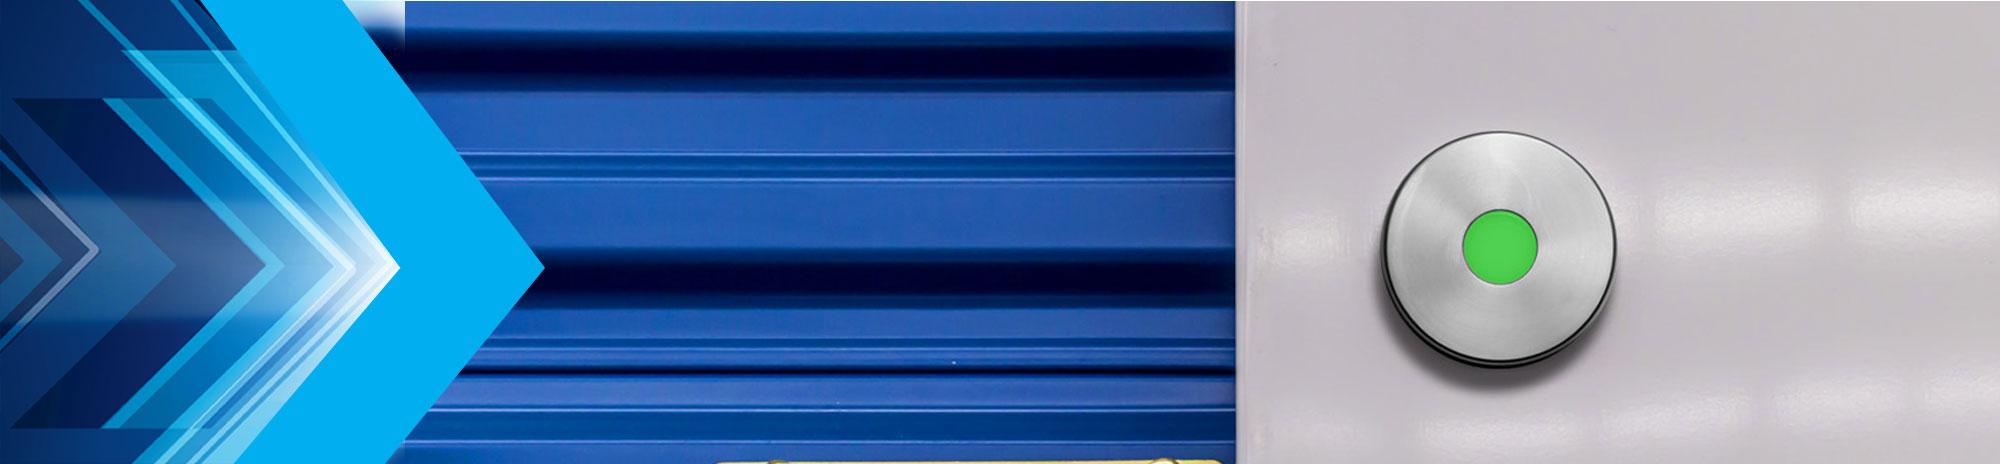 Access_Control_banner.jpg